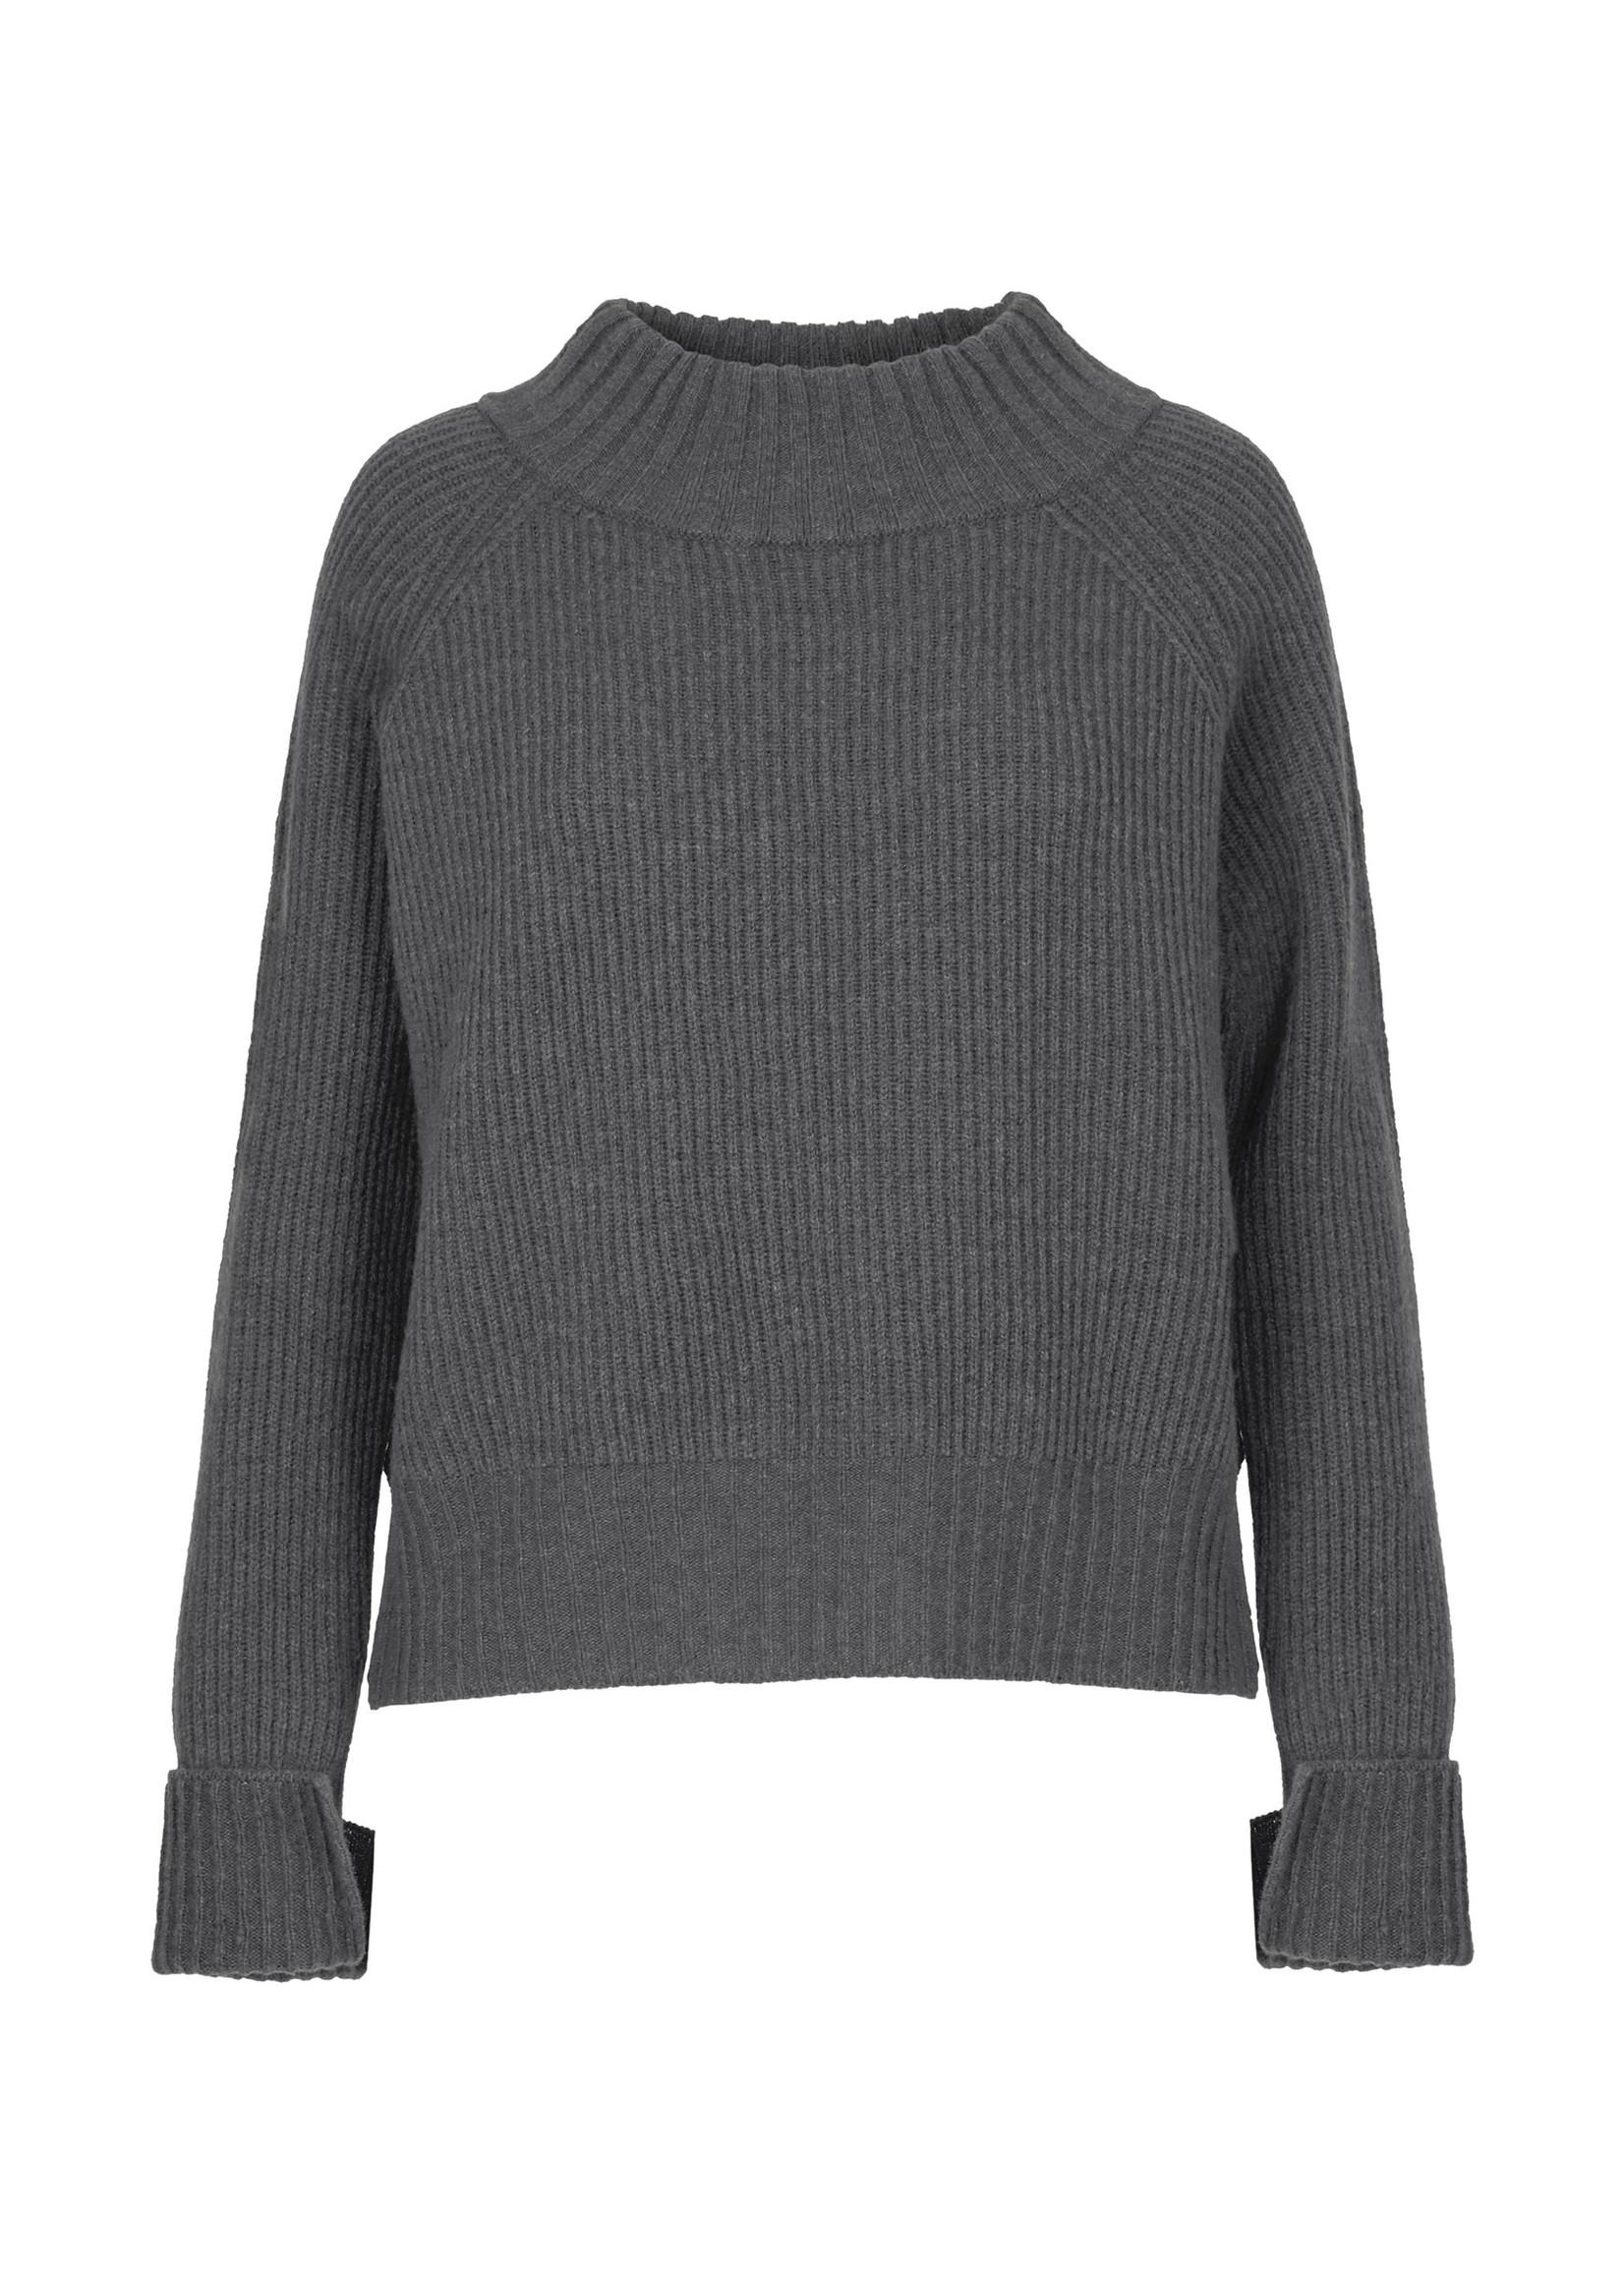 No Man's Land 56.123 Sweater